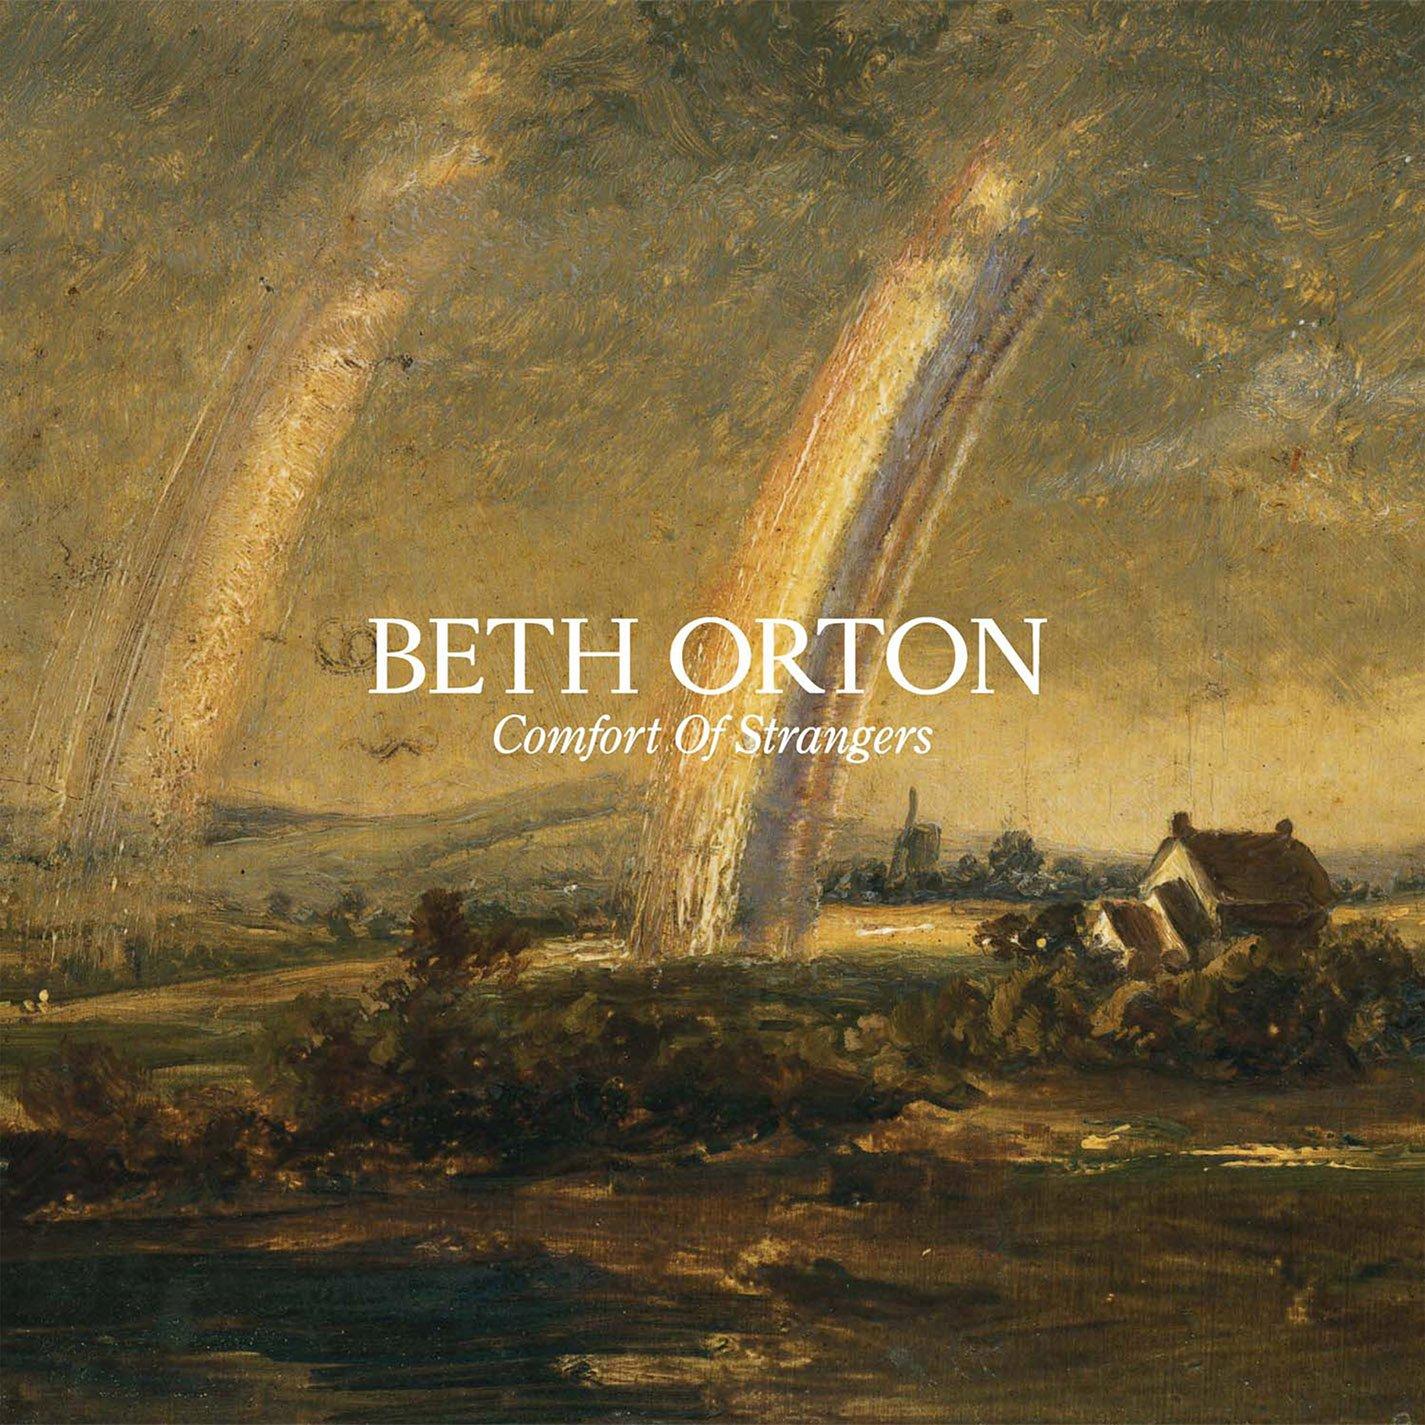 Beth Orton, Comfort of Strangers